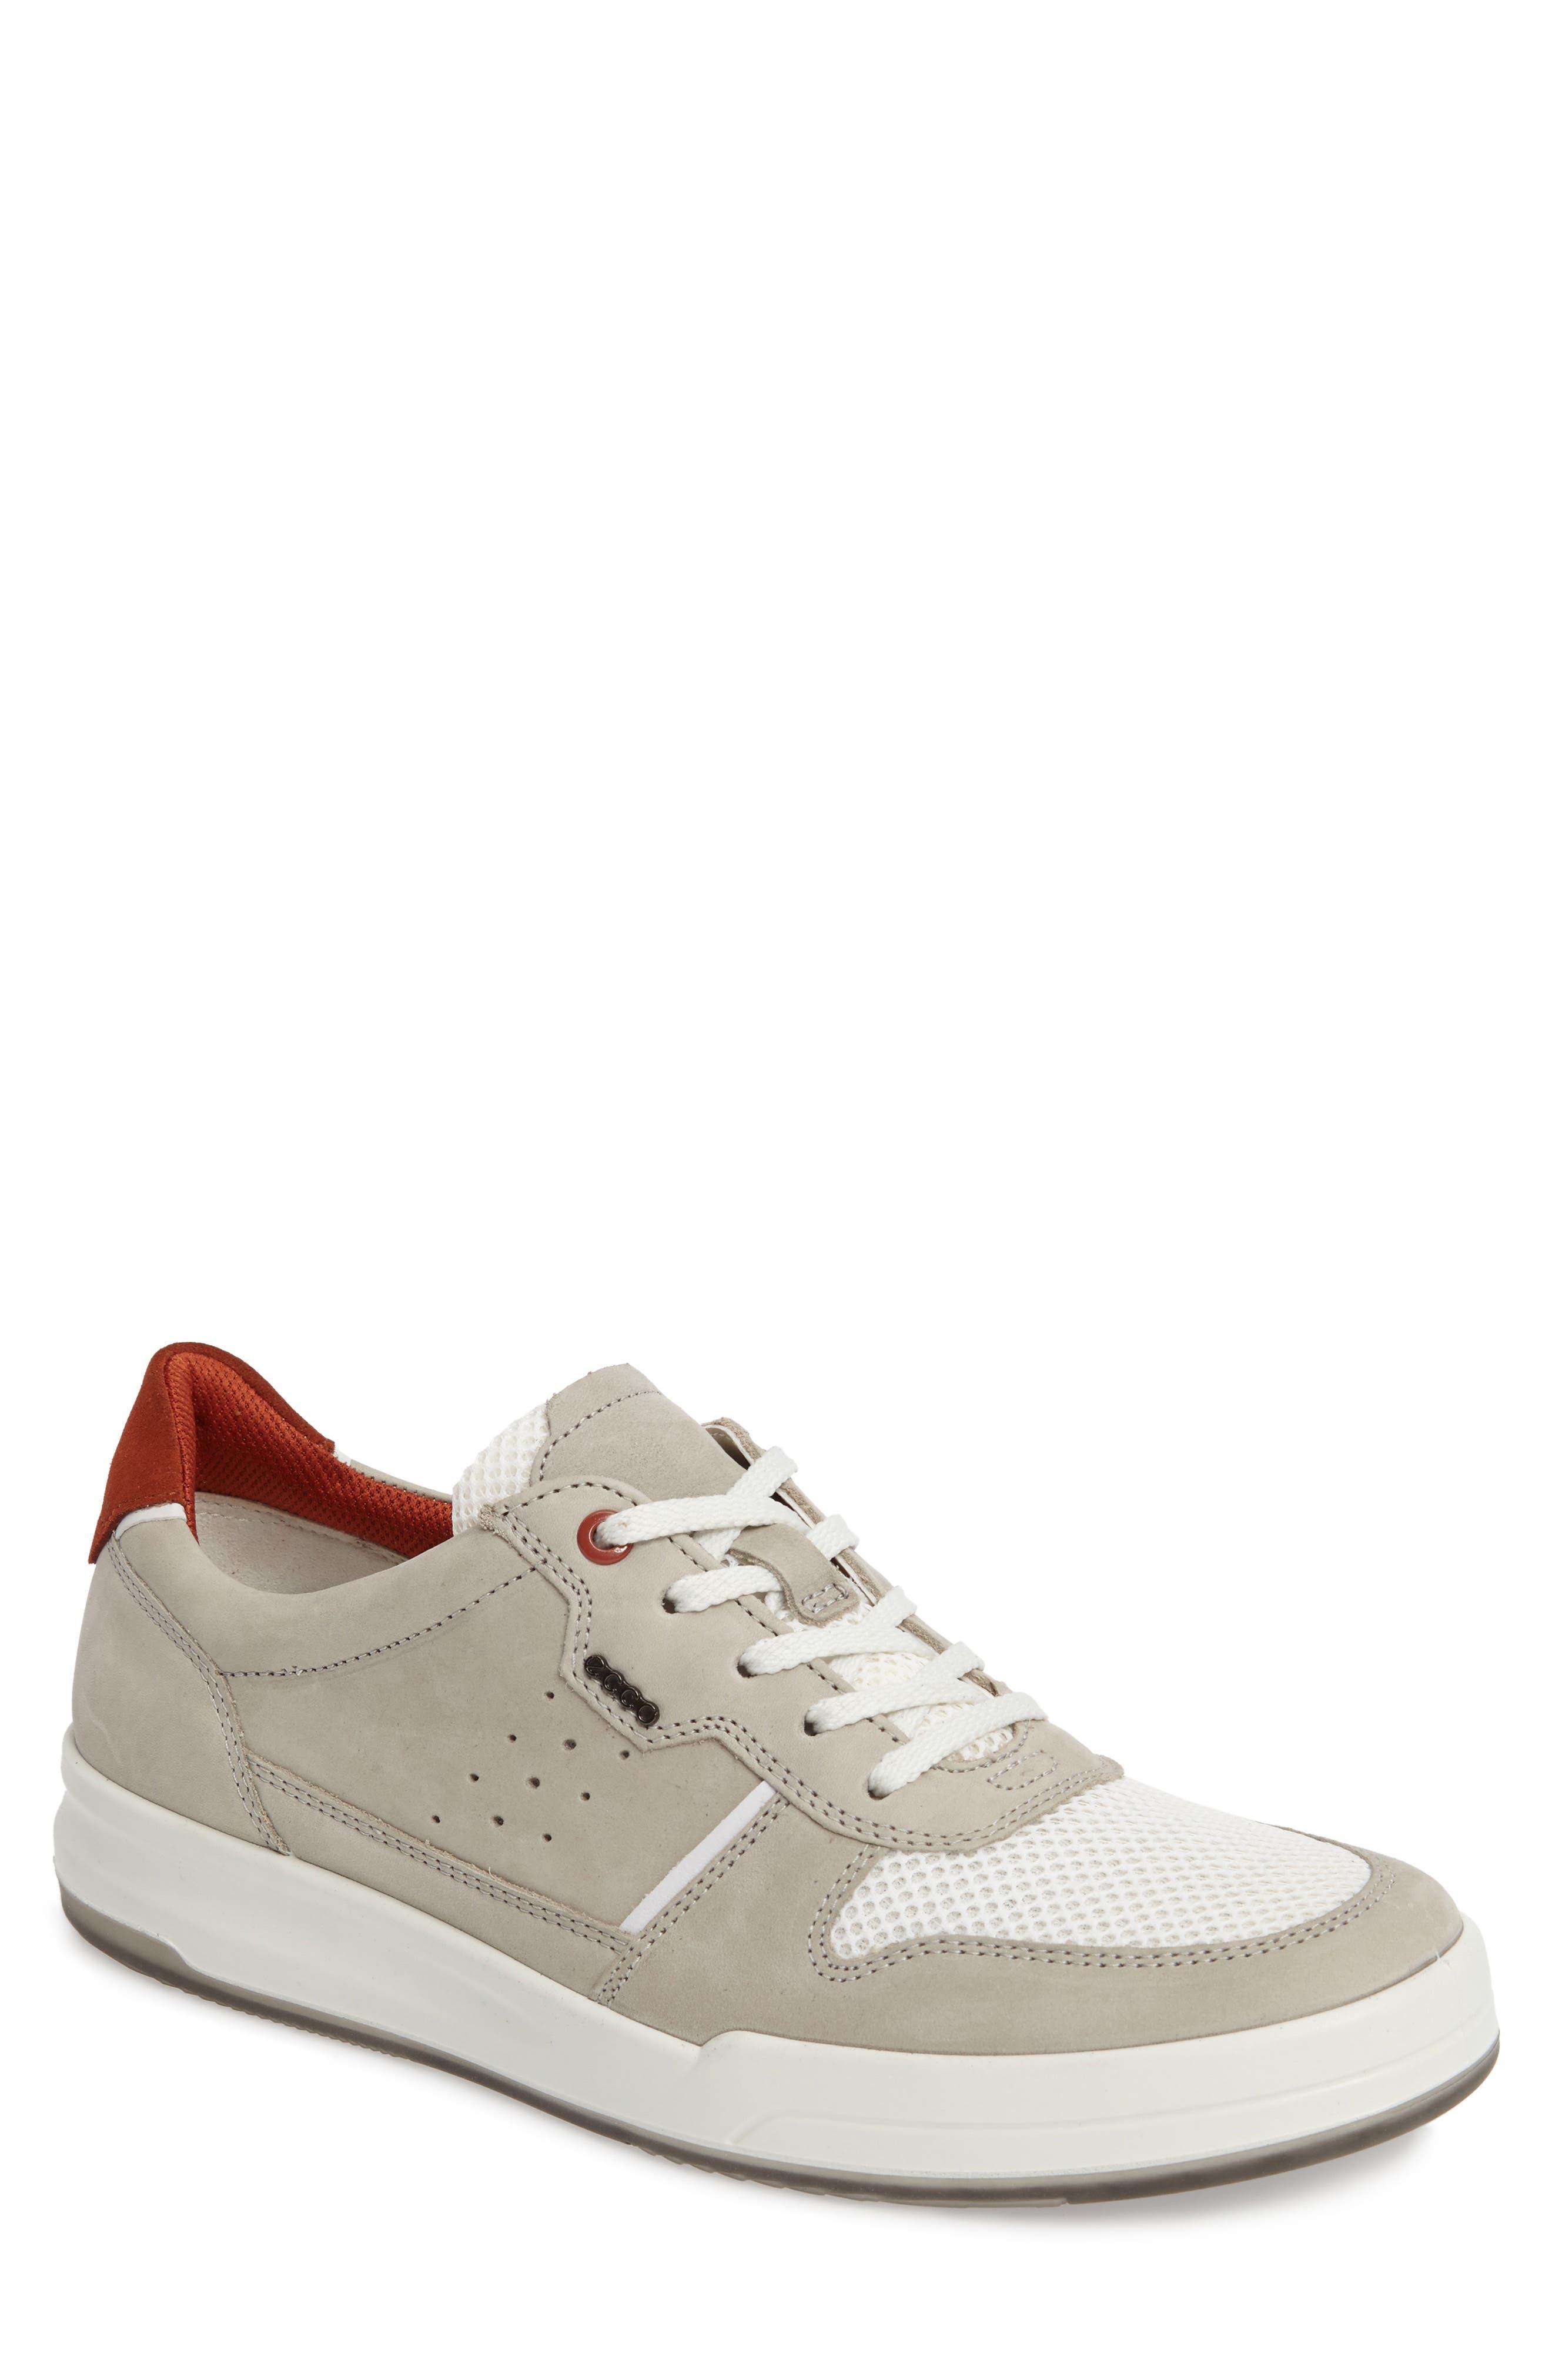 Jack Sneaker,                         Main,                         color, Wild Dove